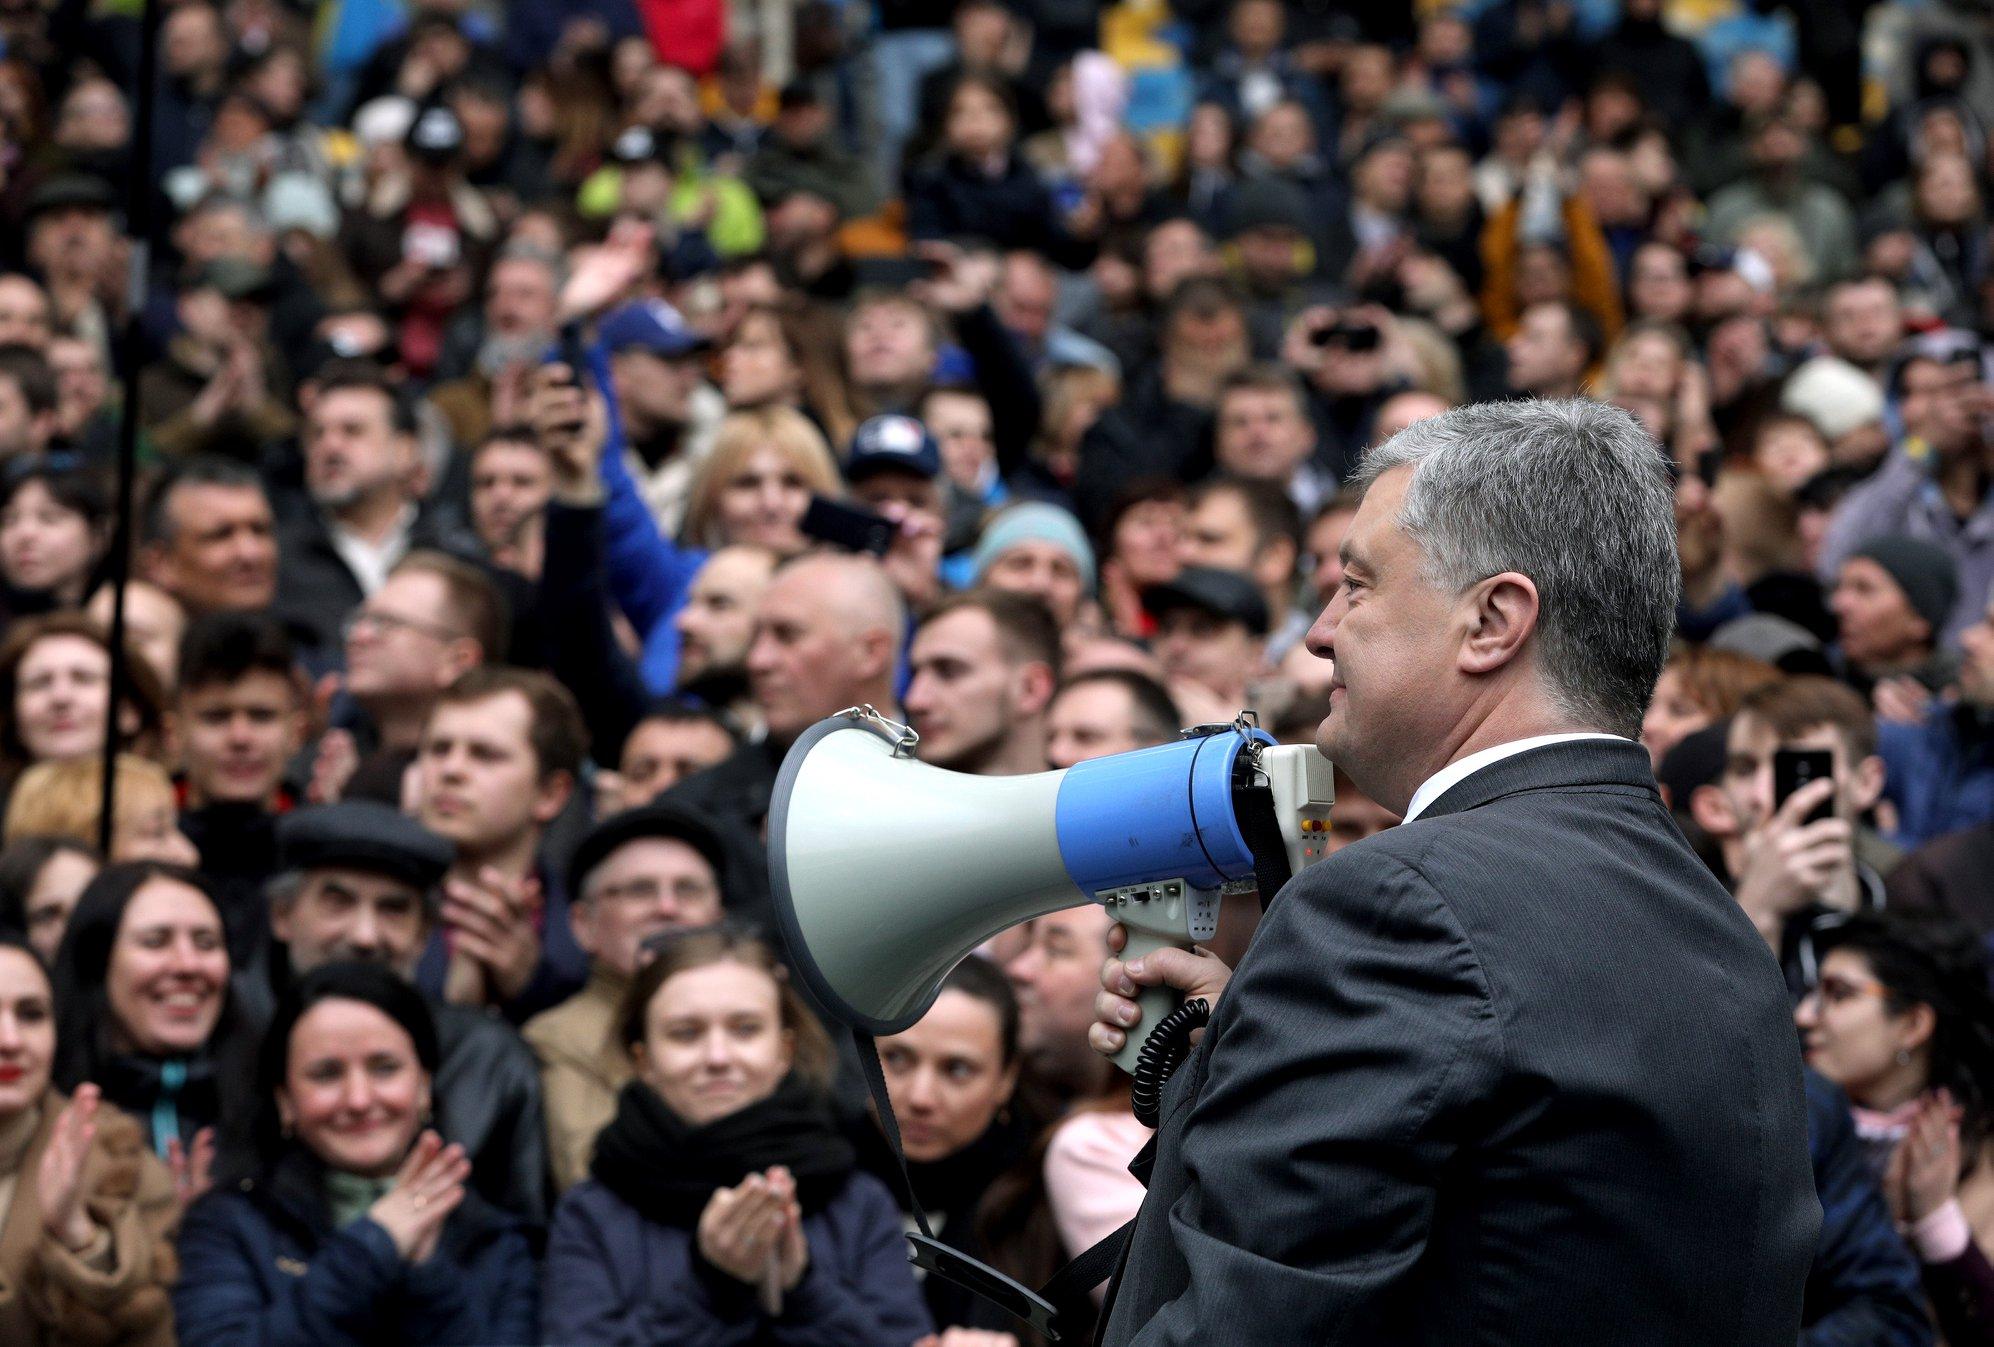 poroșenco și zelenskii, dezbateri pe stadion, alegeri ucraina